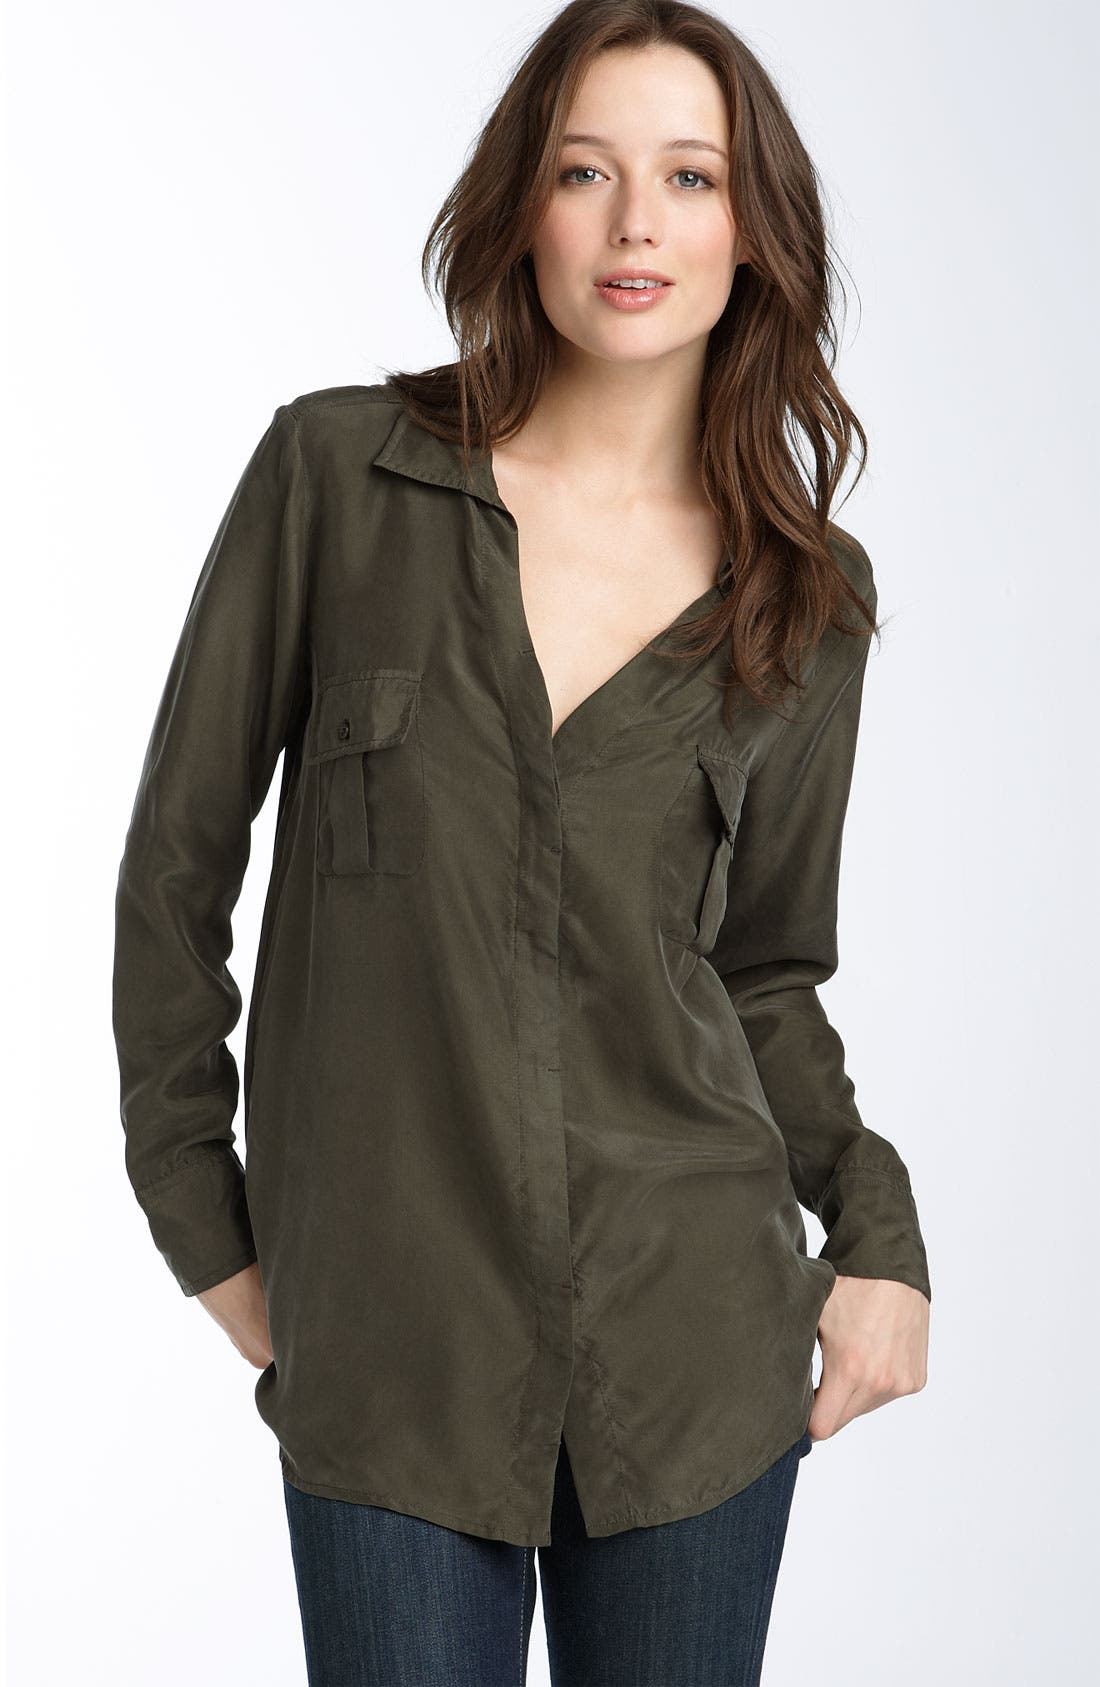 Alternate Image 1 Selected - Calvin Klein Jeans Boyfriend Shirt